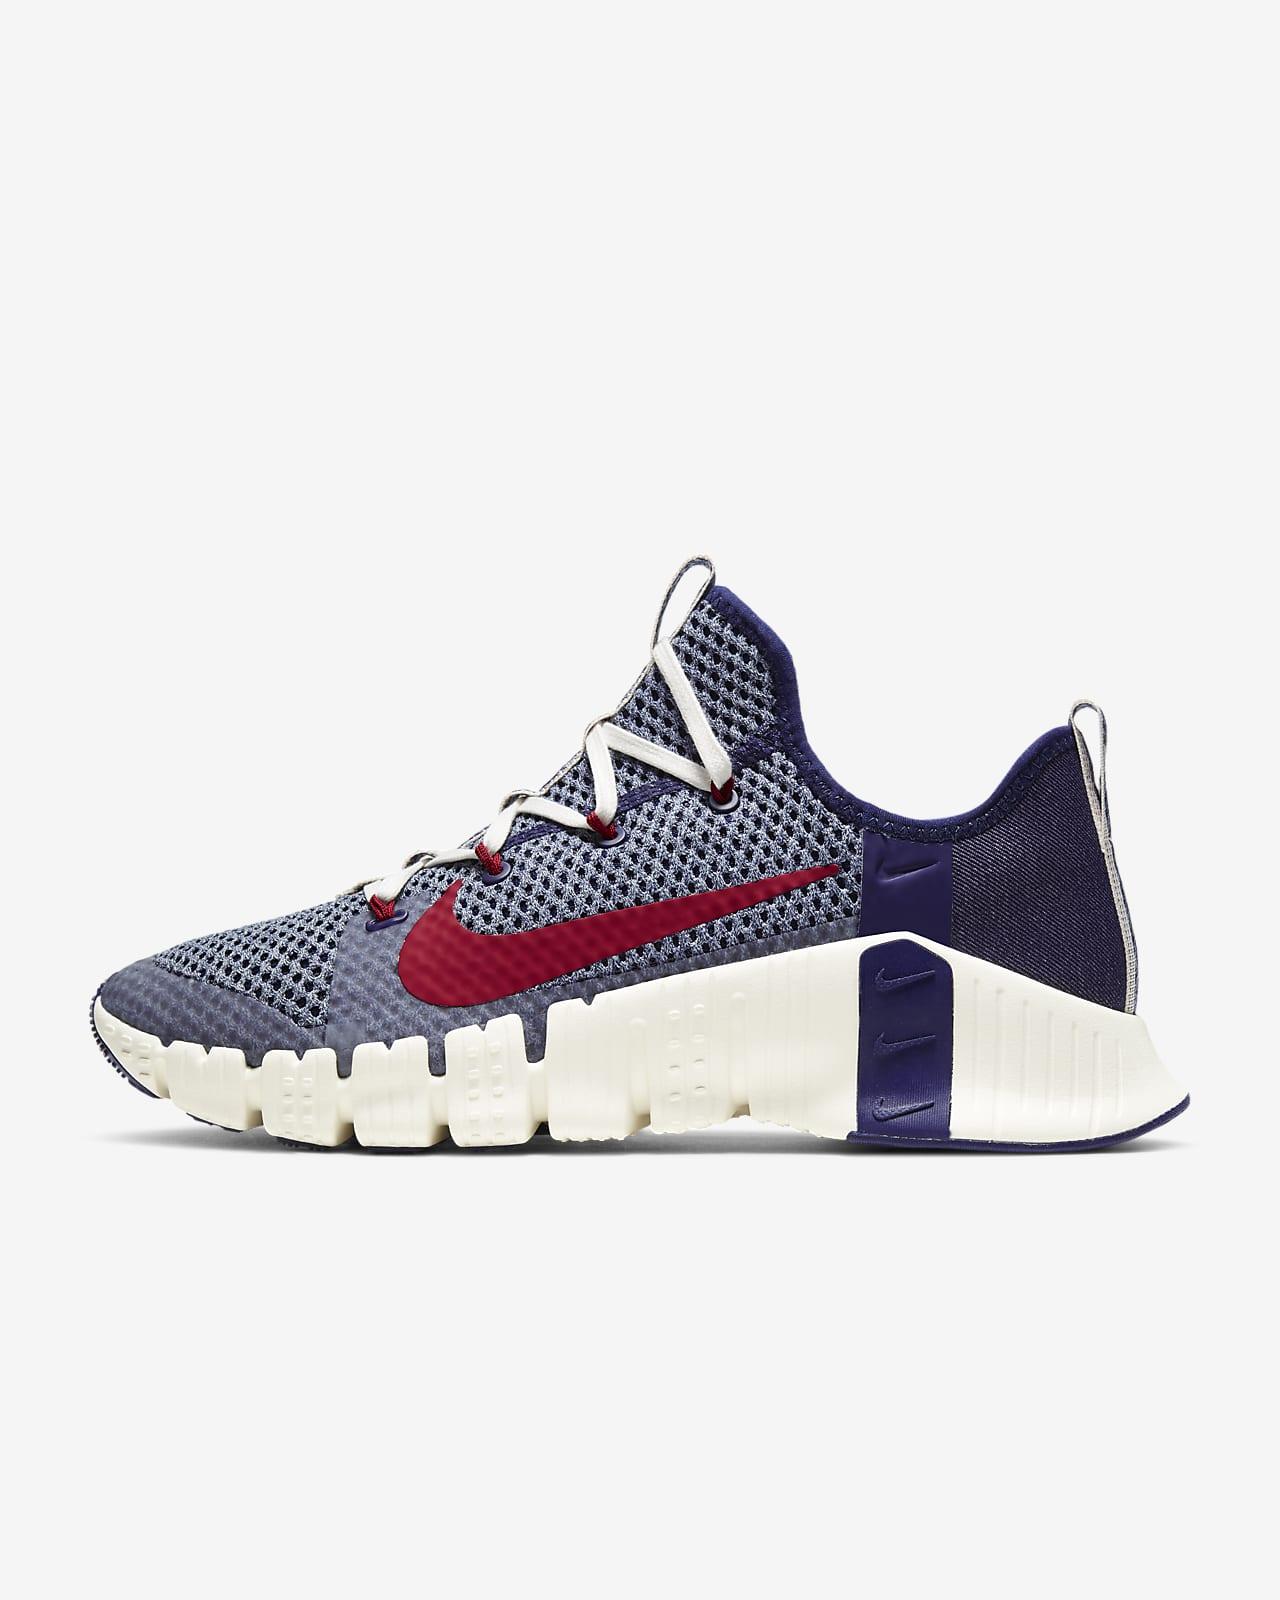 Chaussure de training Nike Free Metcon 3 AMP